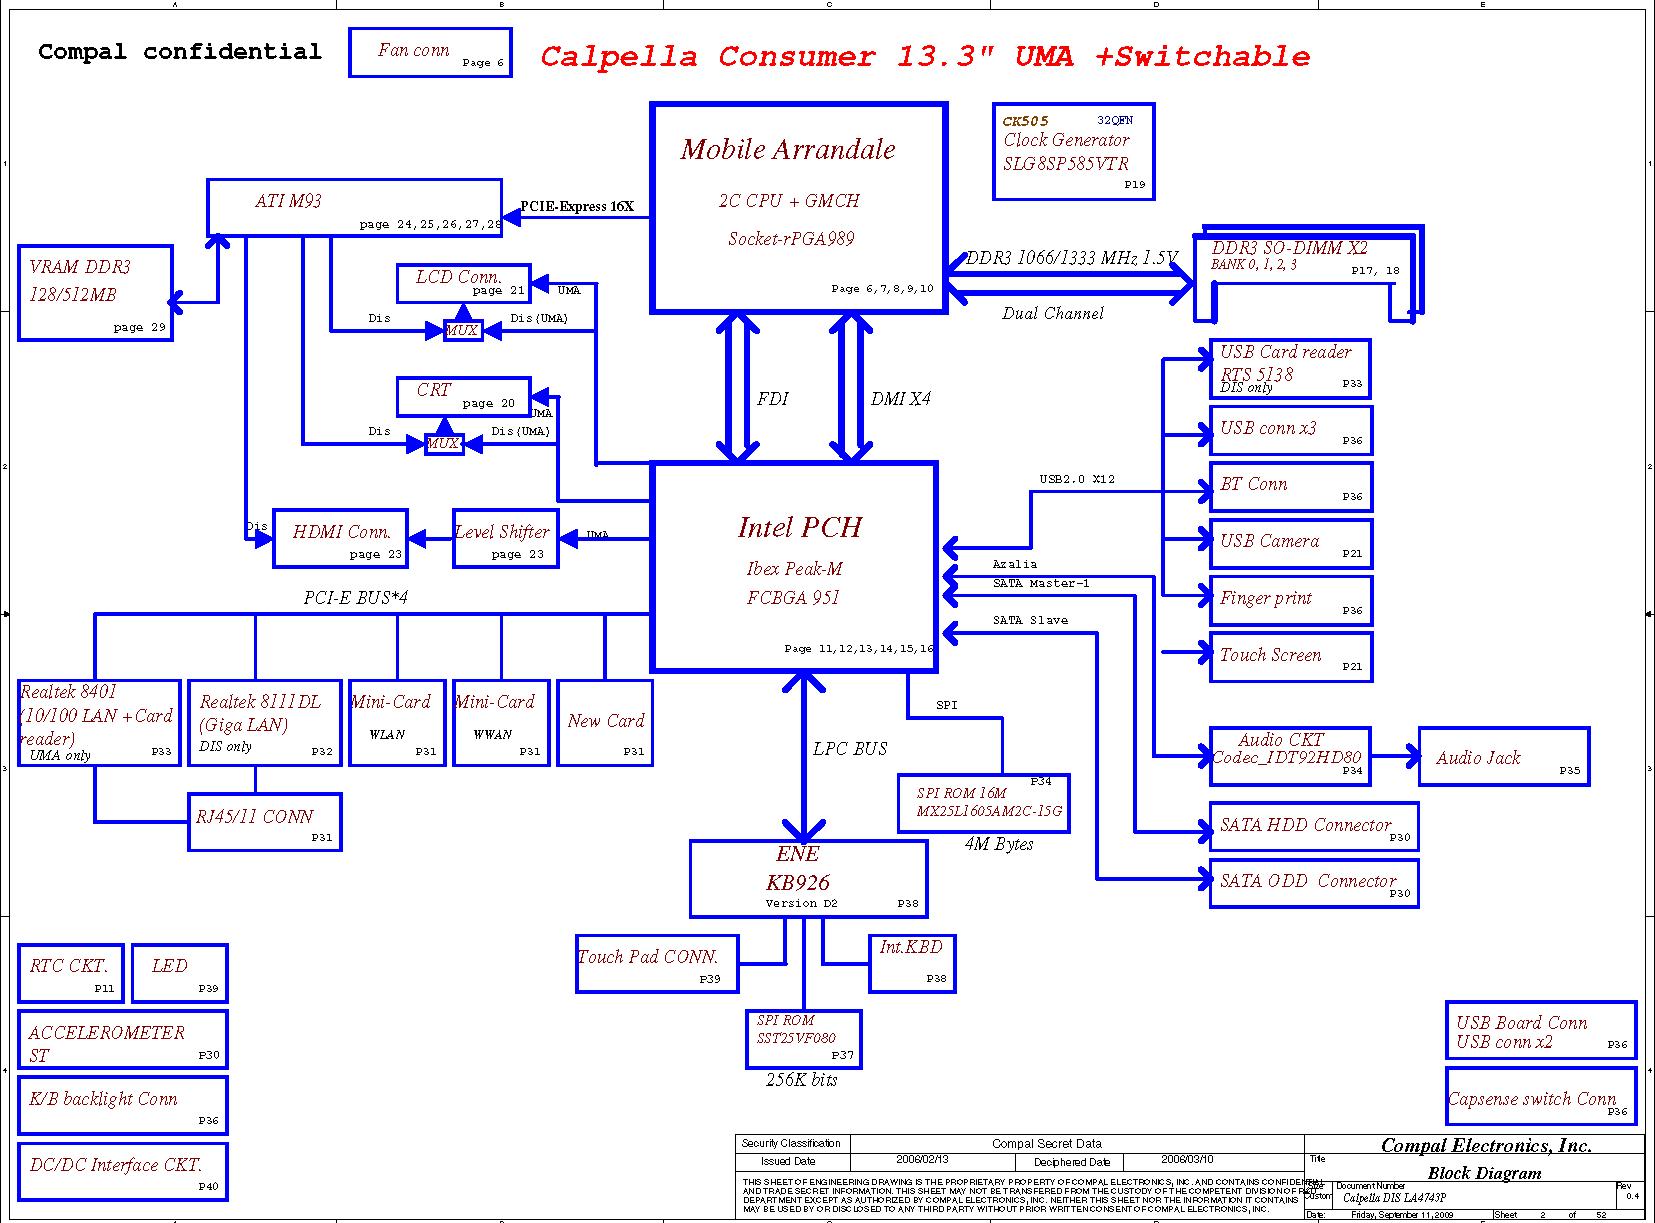 Hp Compaq Nc4200 Tc4200 Laptop Block Diagram | #1 Wiring